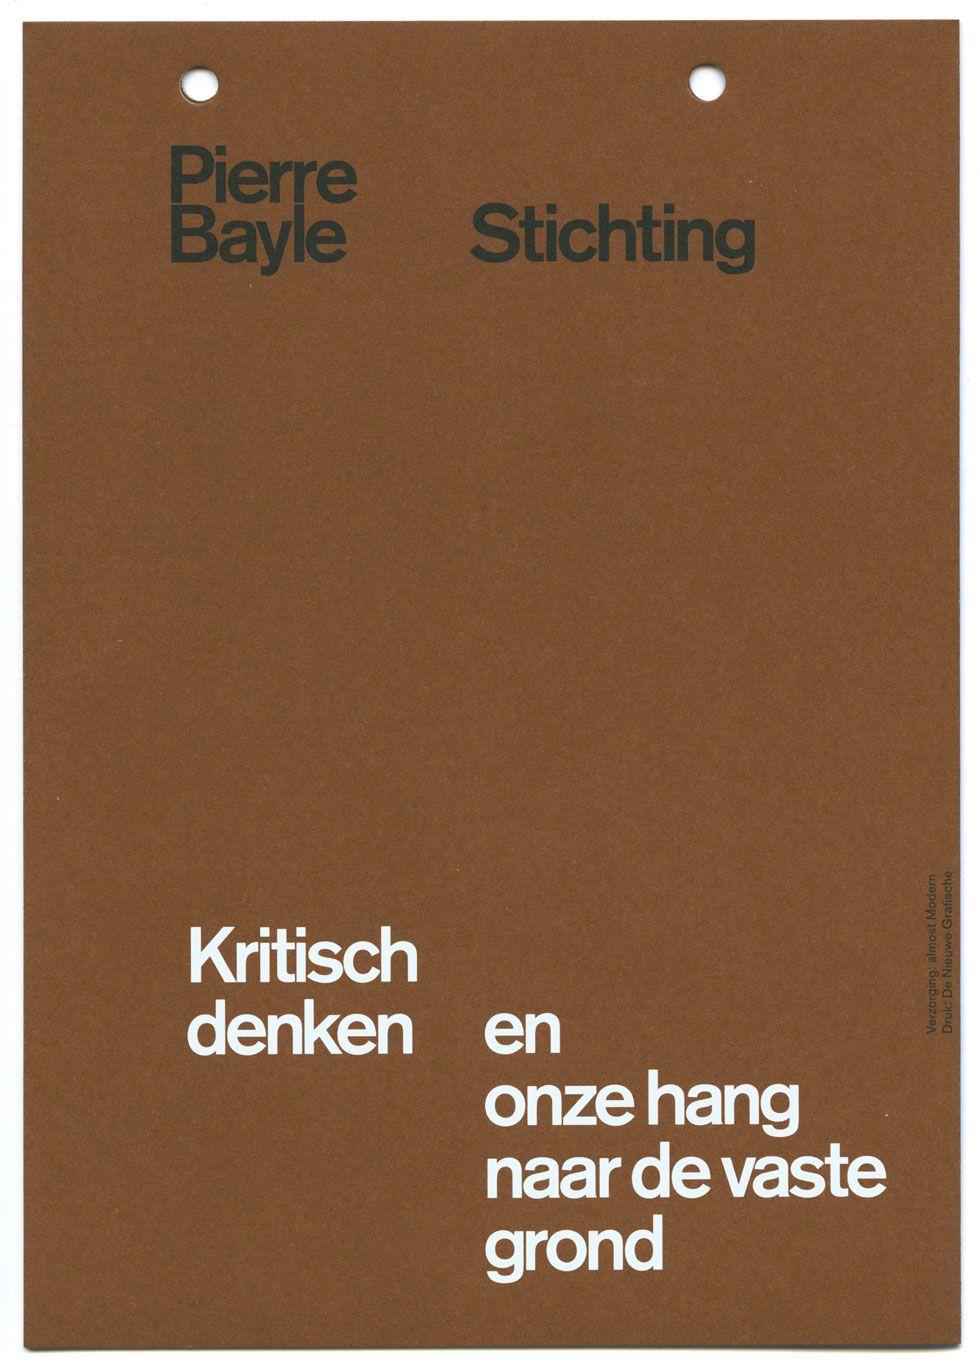 almost Modern : Pierre Bayle Stichting II